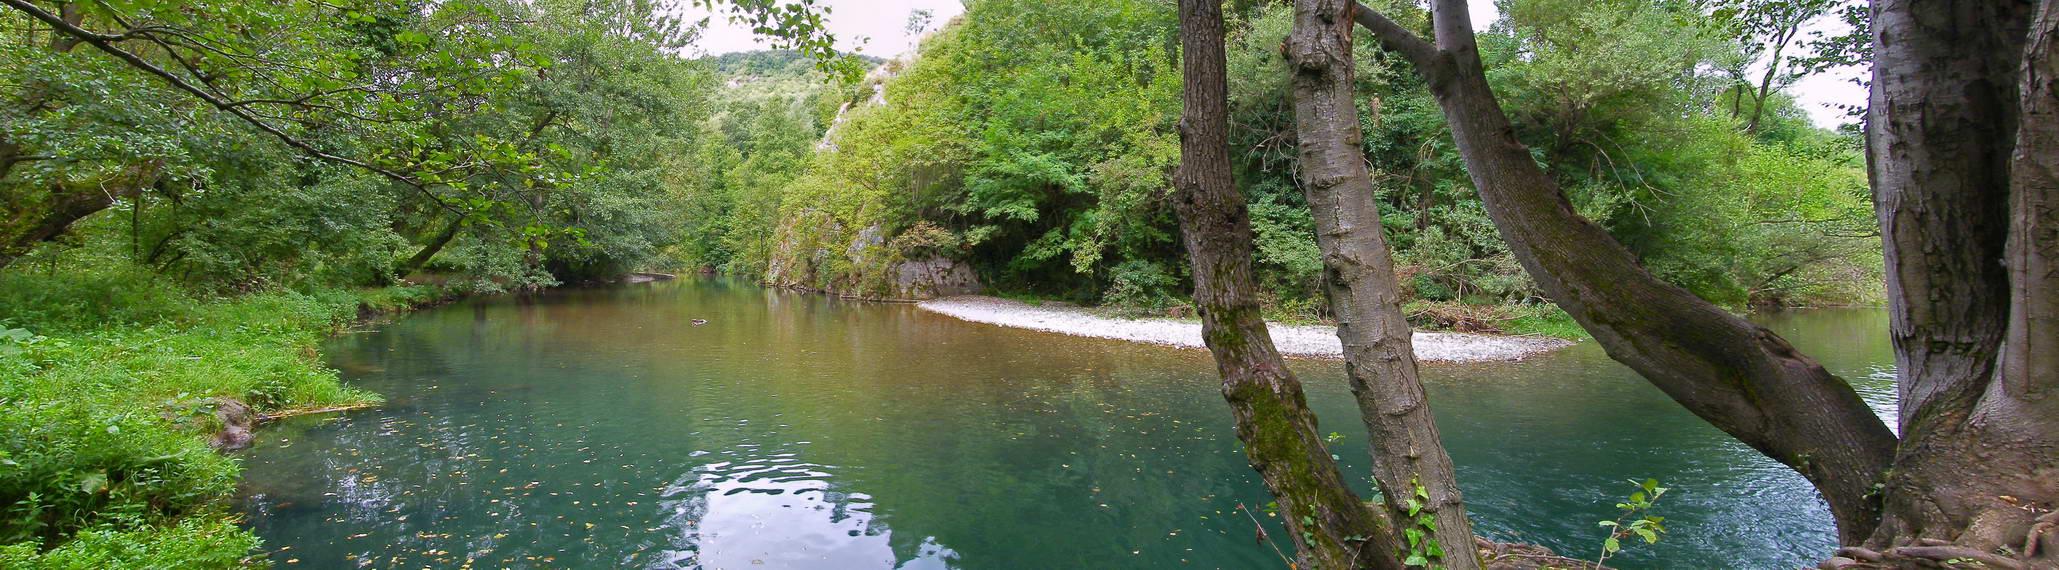 Staze i bogaze | Kanjon reke Gradac